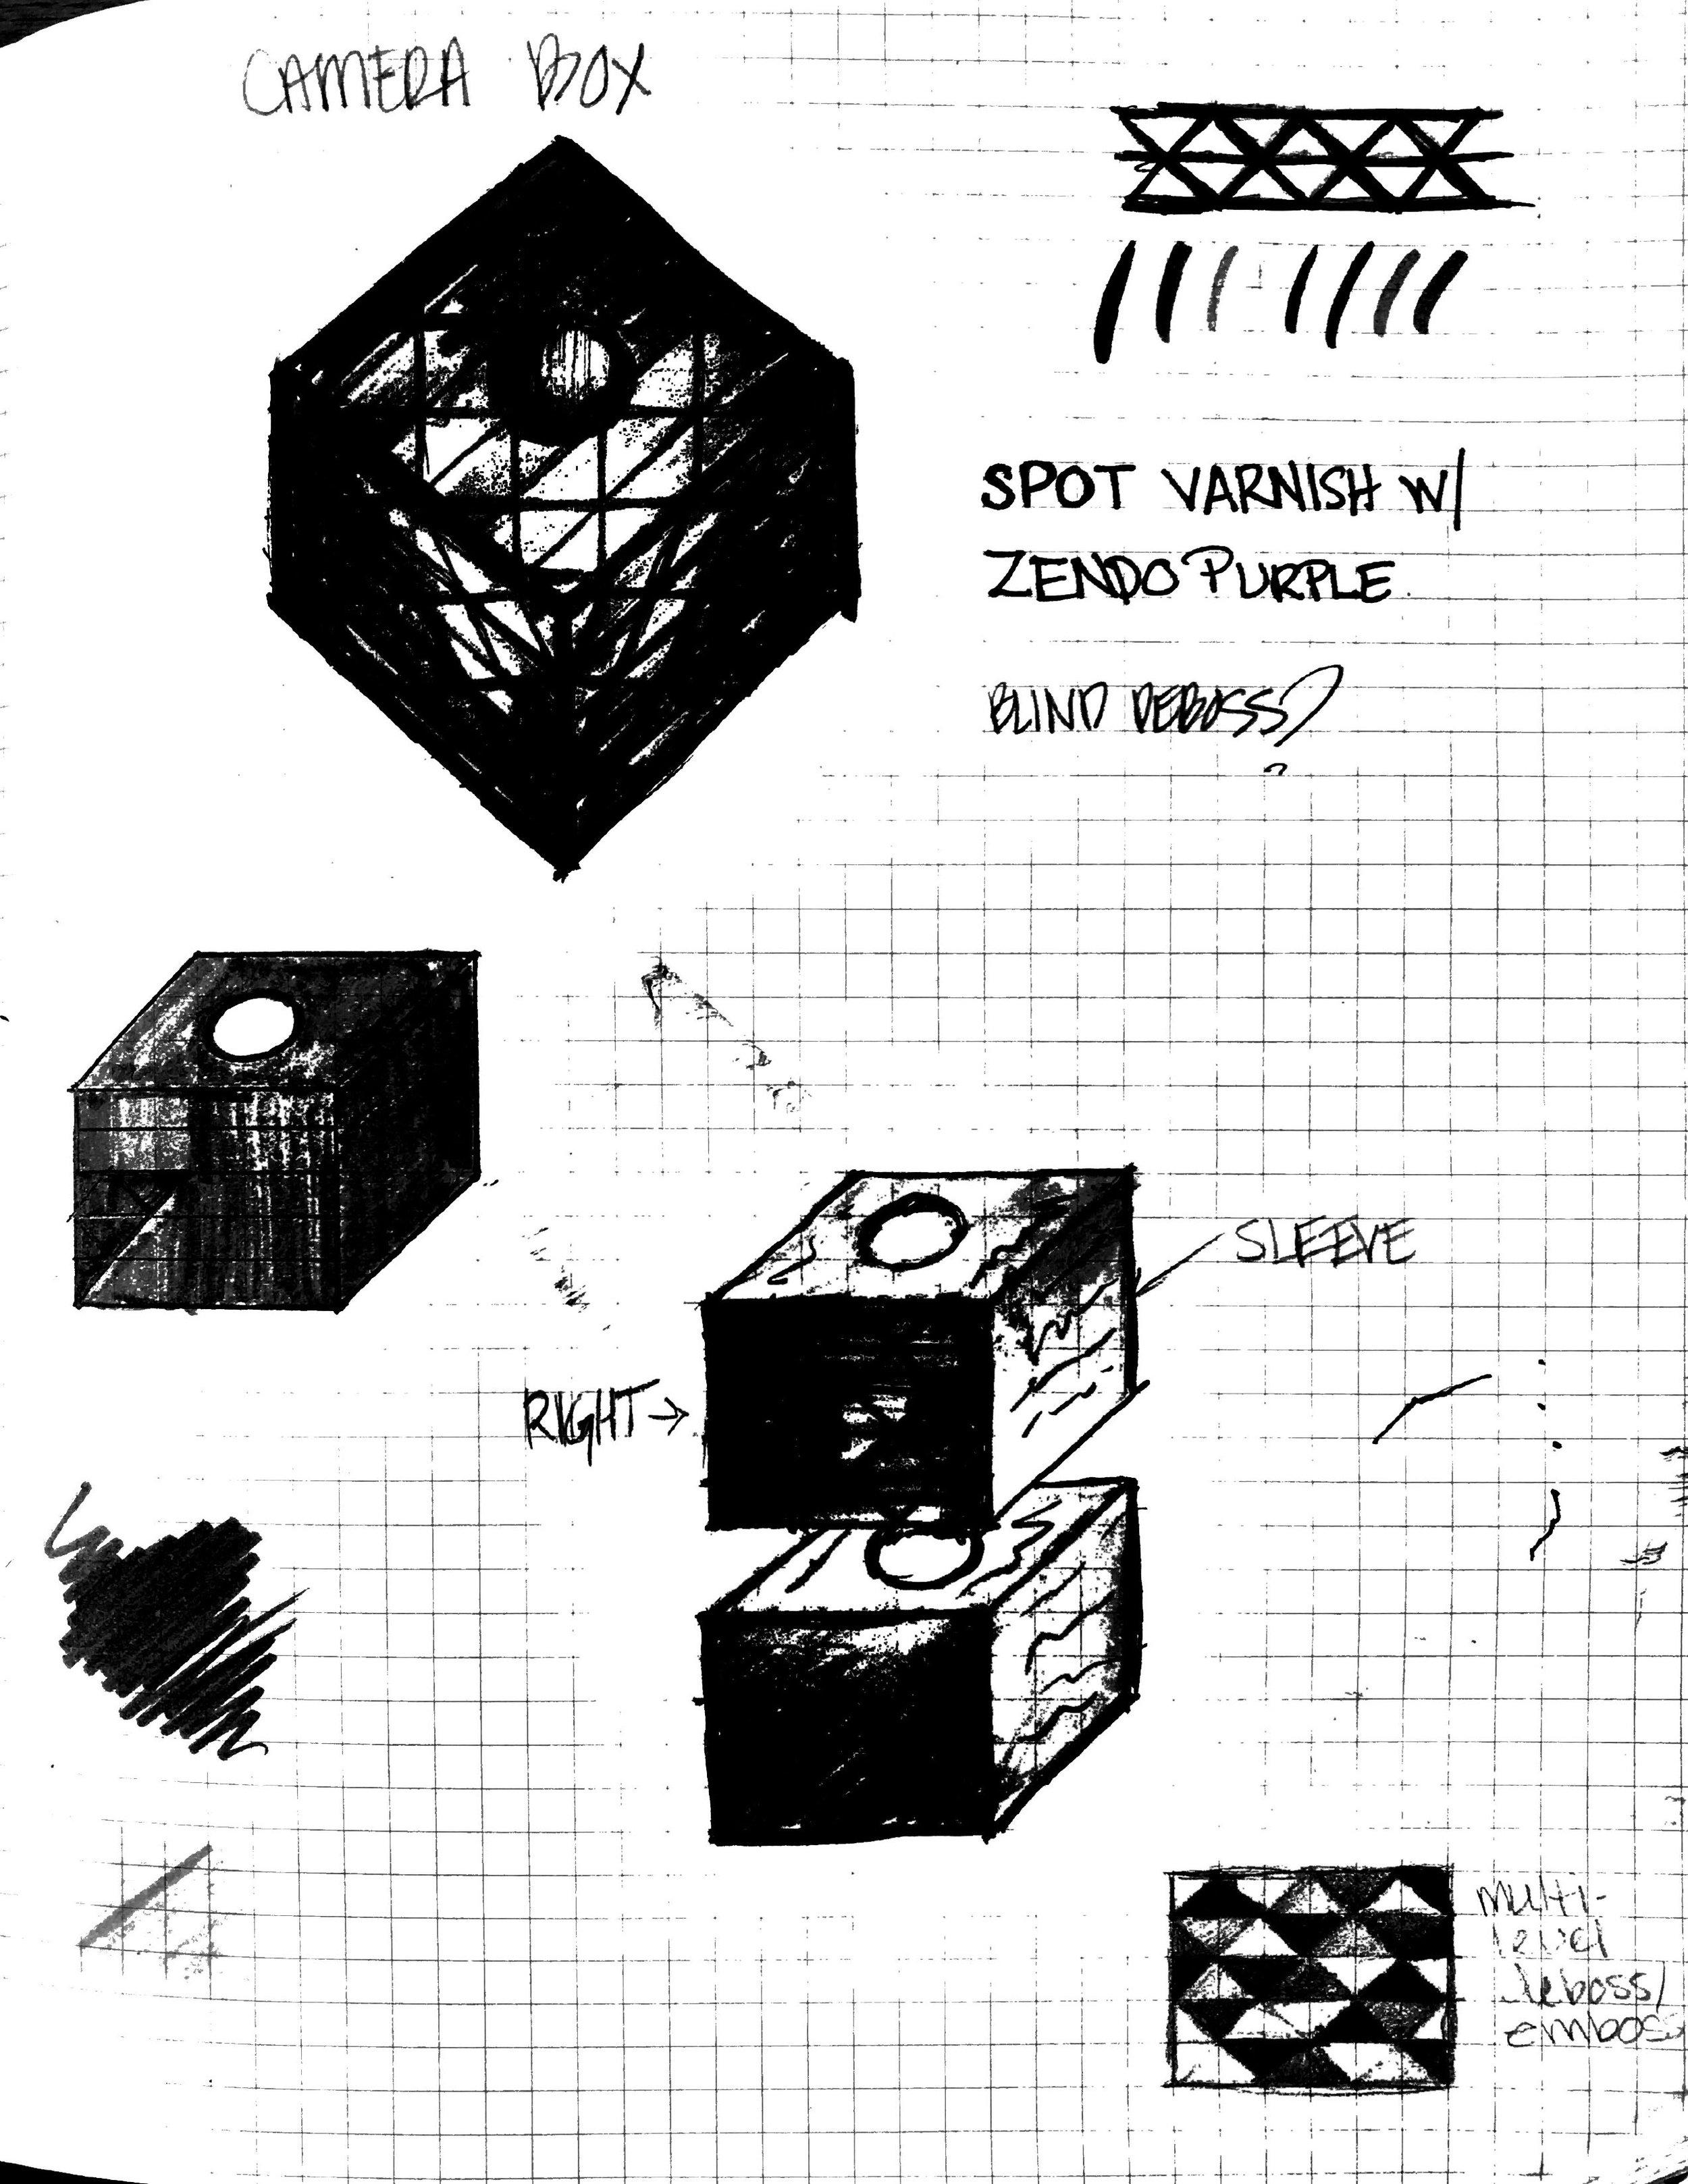 Zendo-Packaging8.jpg